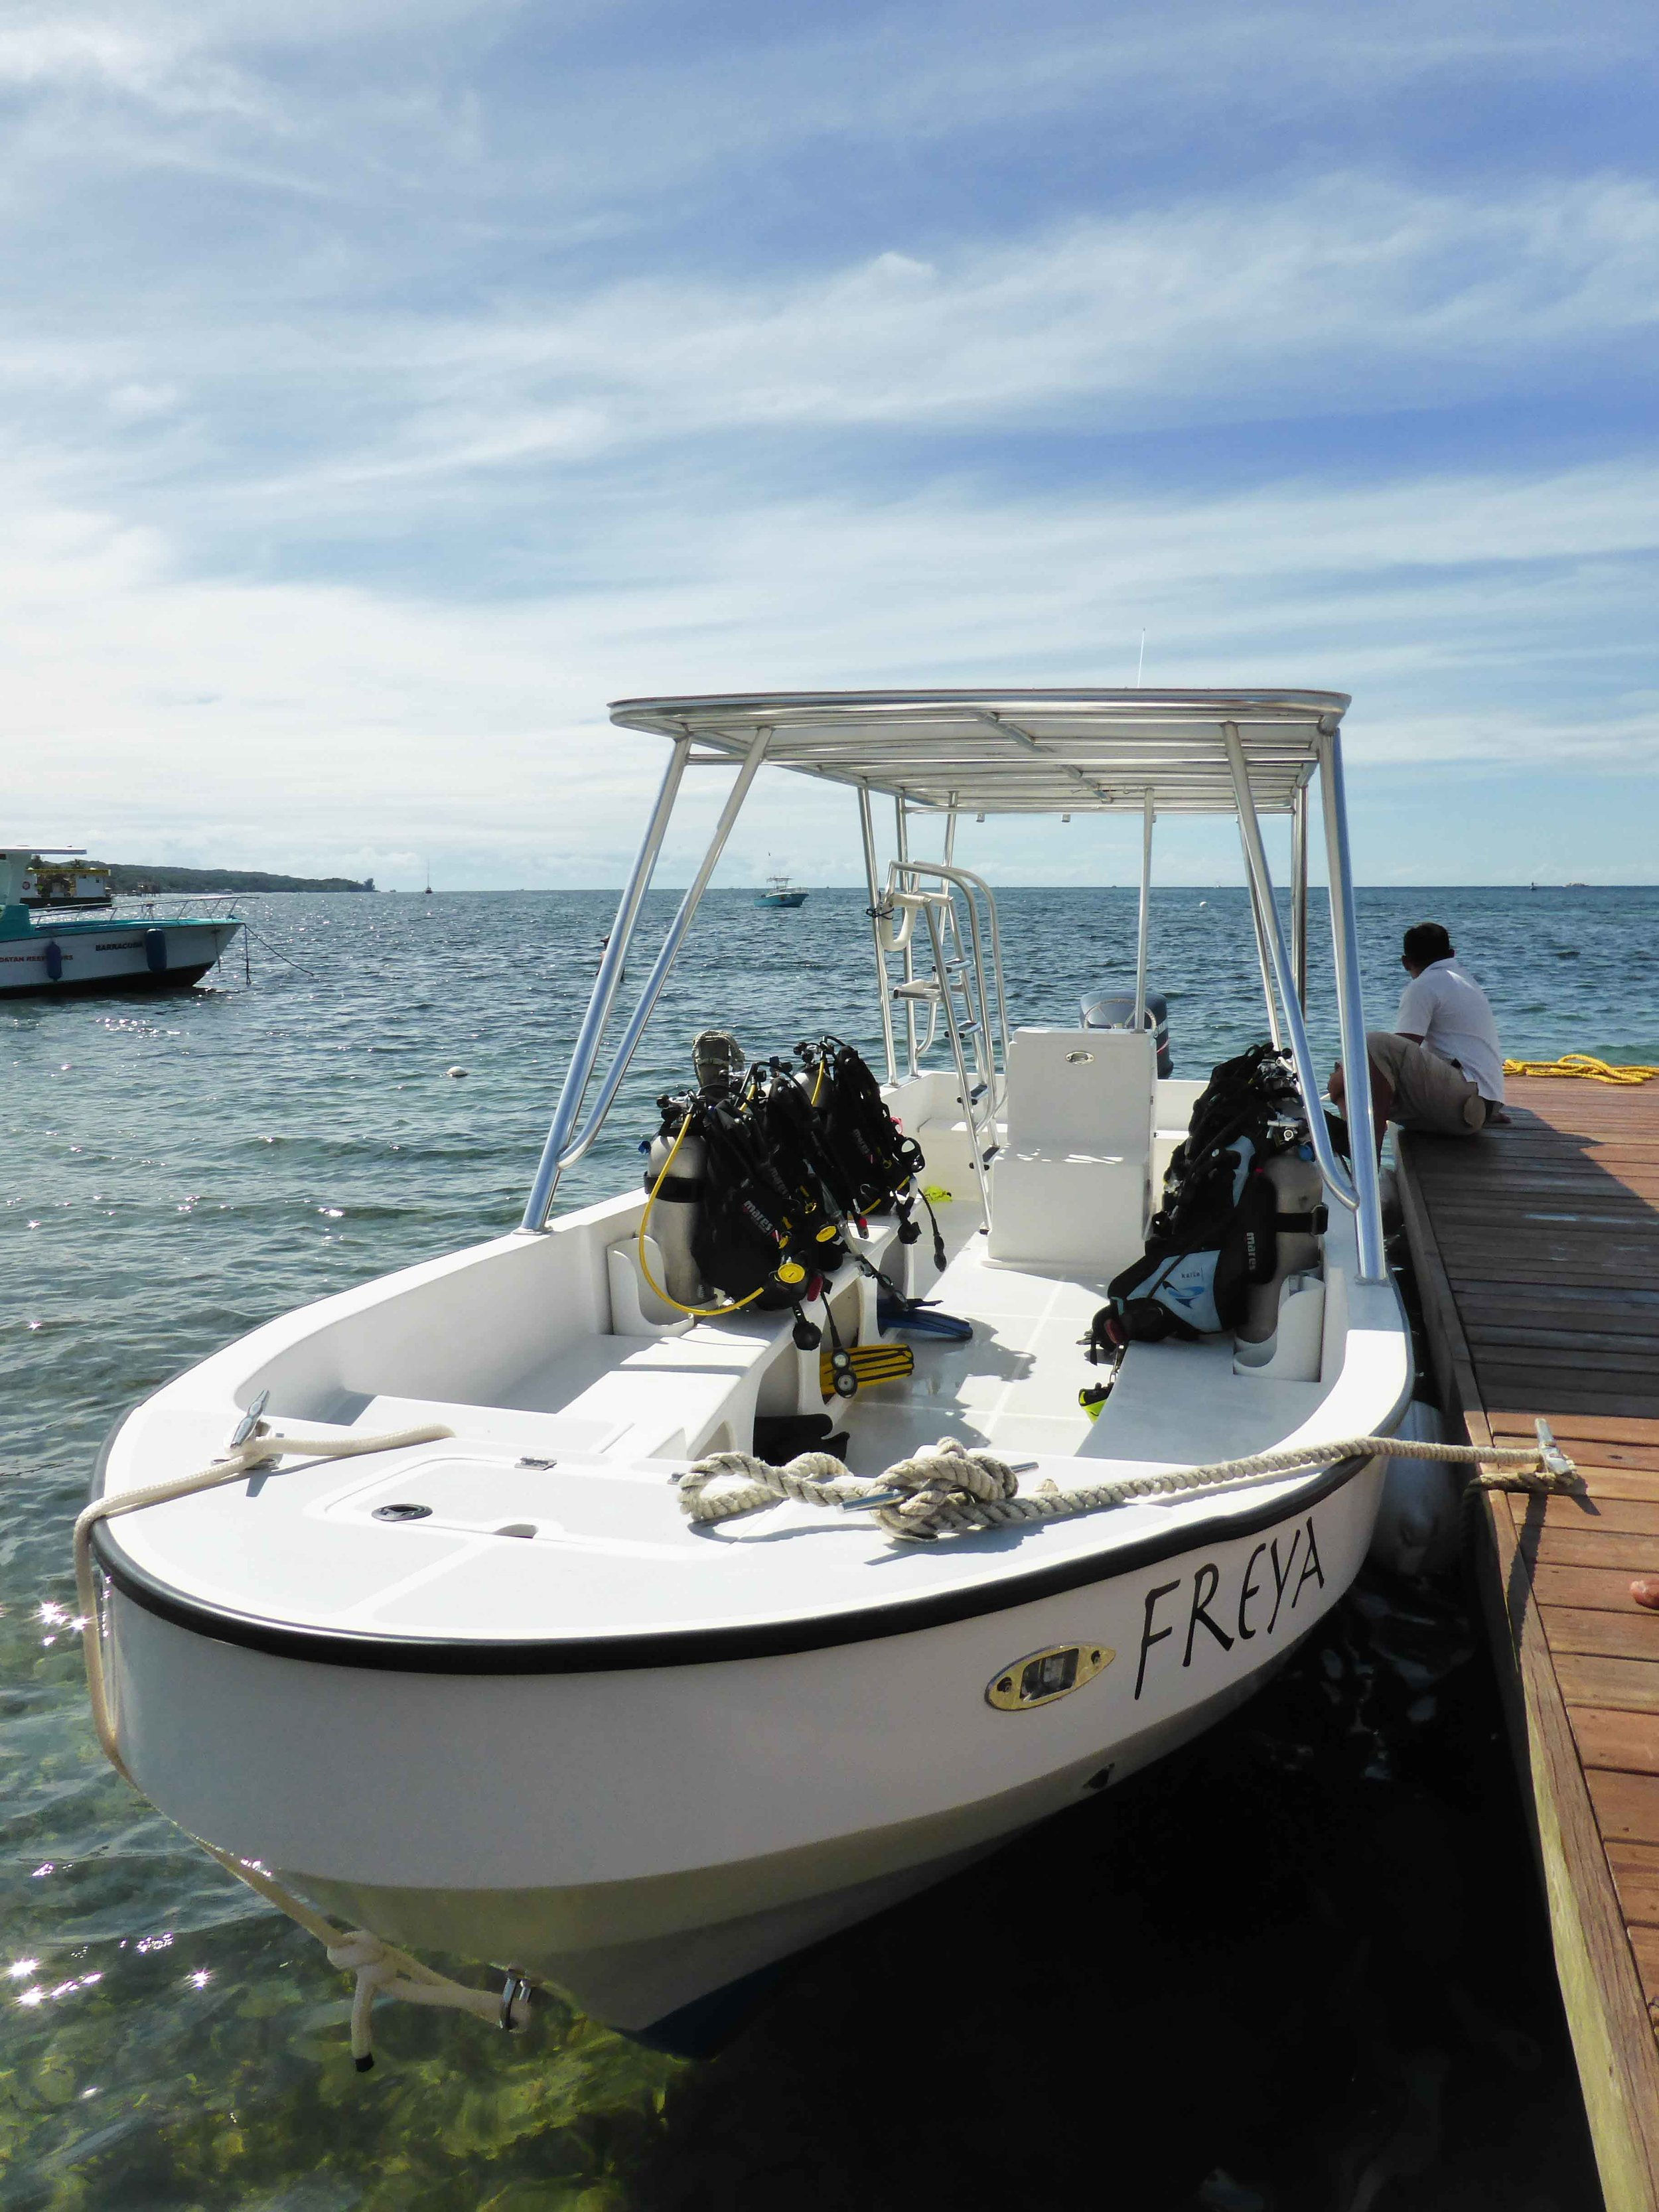 Roatan Divers boat, Freya